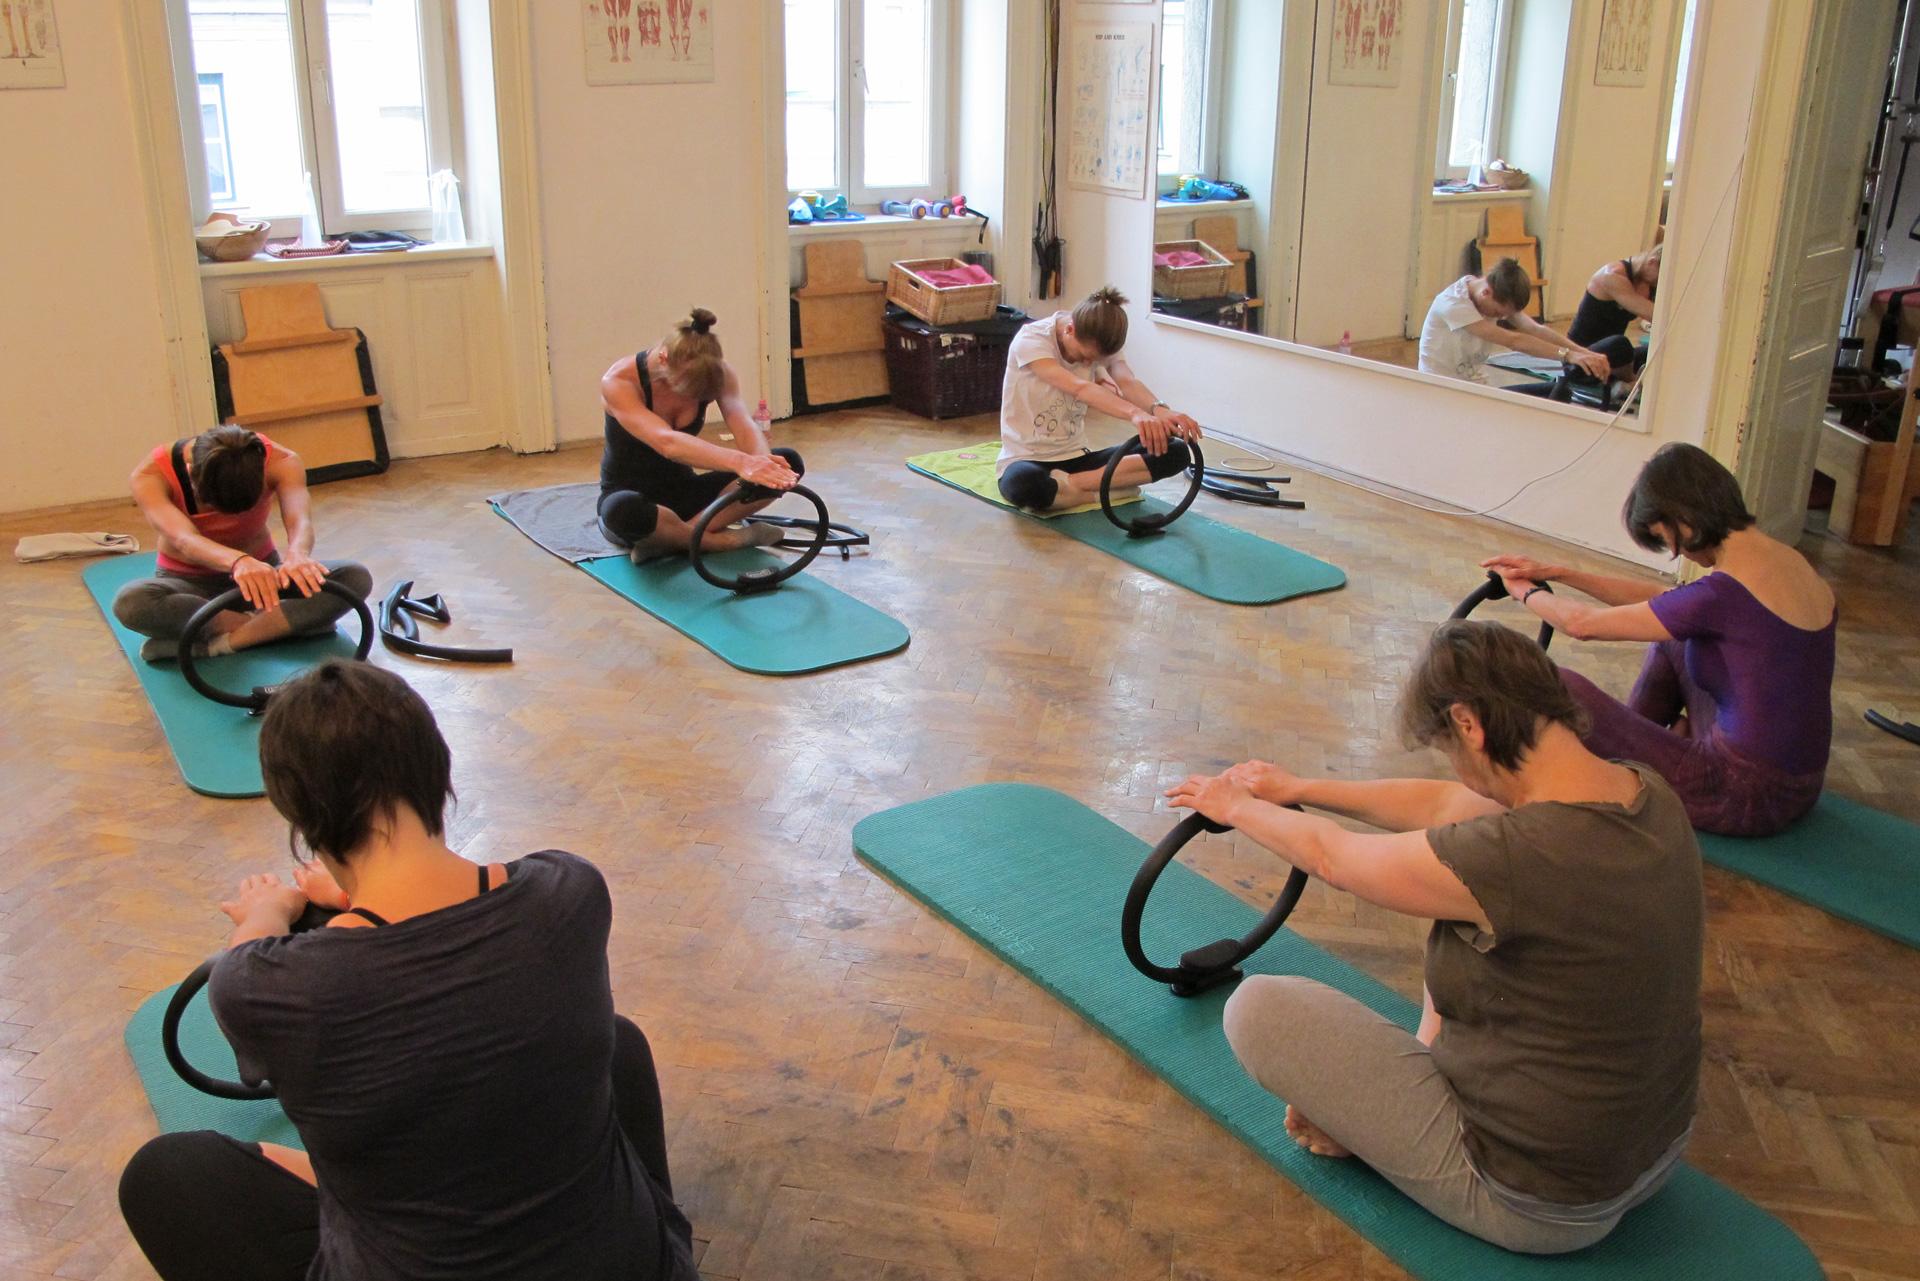 Pilates lateral posteriore Atmung Trainingsoptimierung Vorbereitung Core Stabilität Zwerchfell Entspannung Schultergürtelstabilisation kinästhetisches Feedback Wahrnehmungsübung